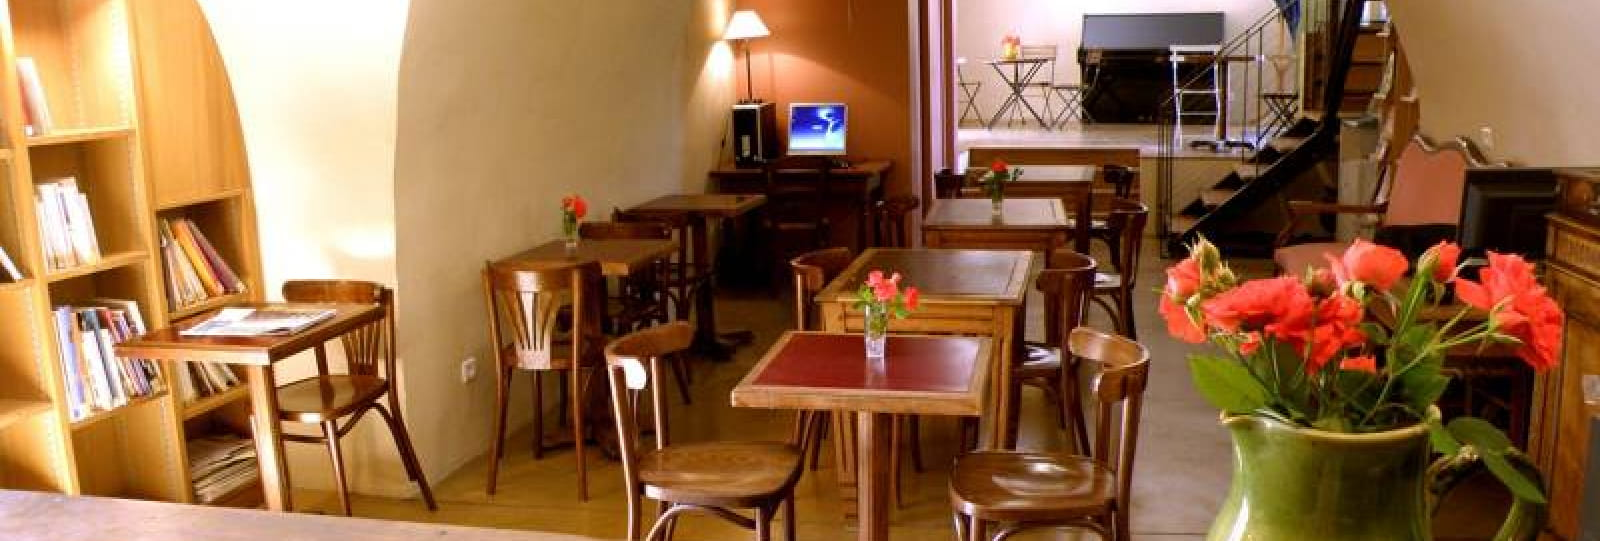 Cafébibliothèque de Chabrillan